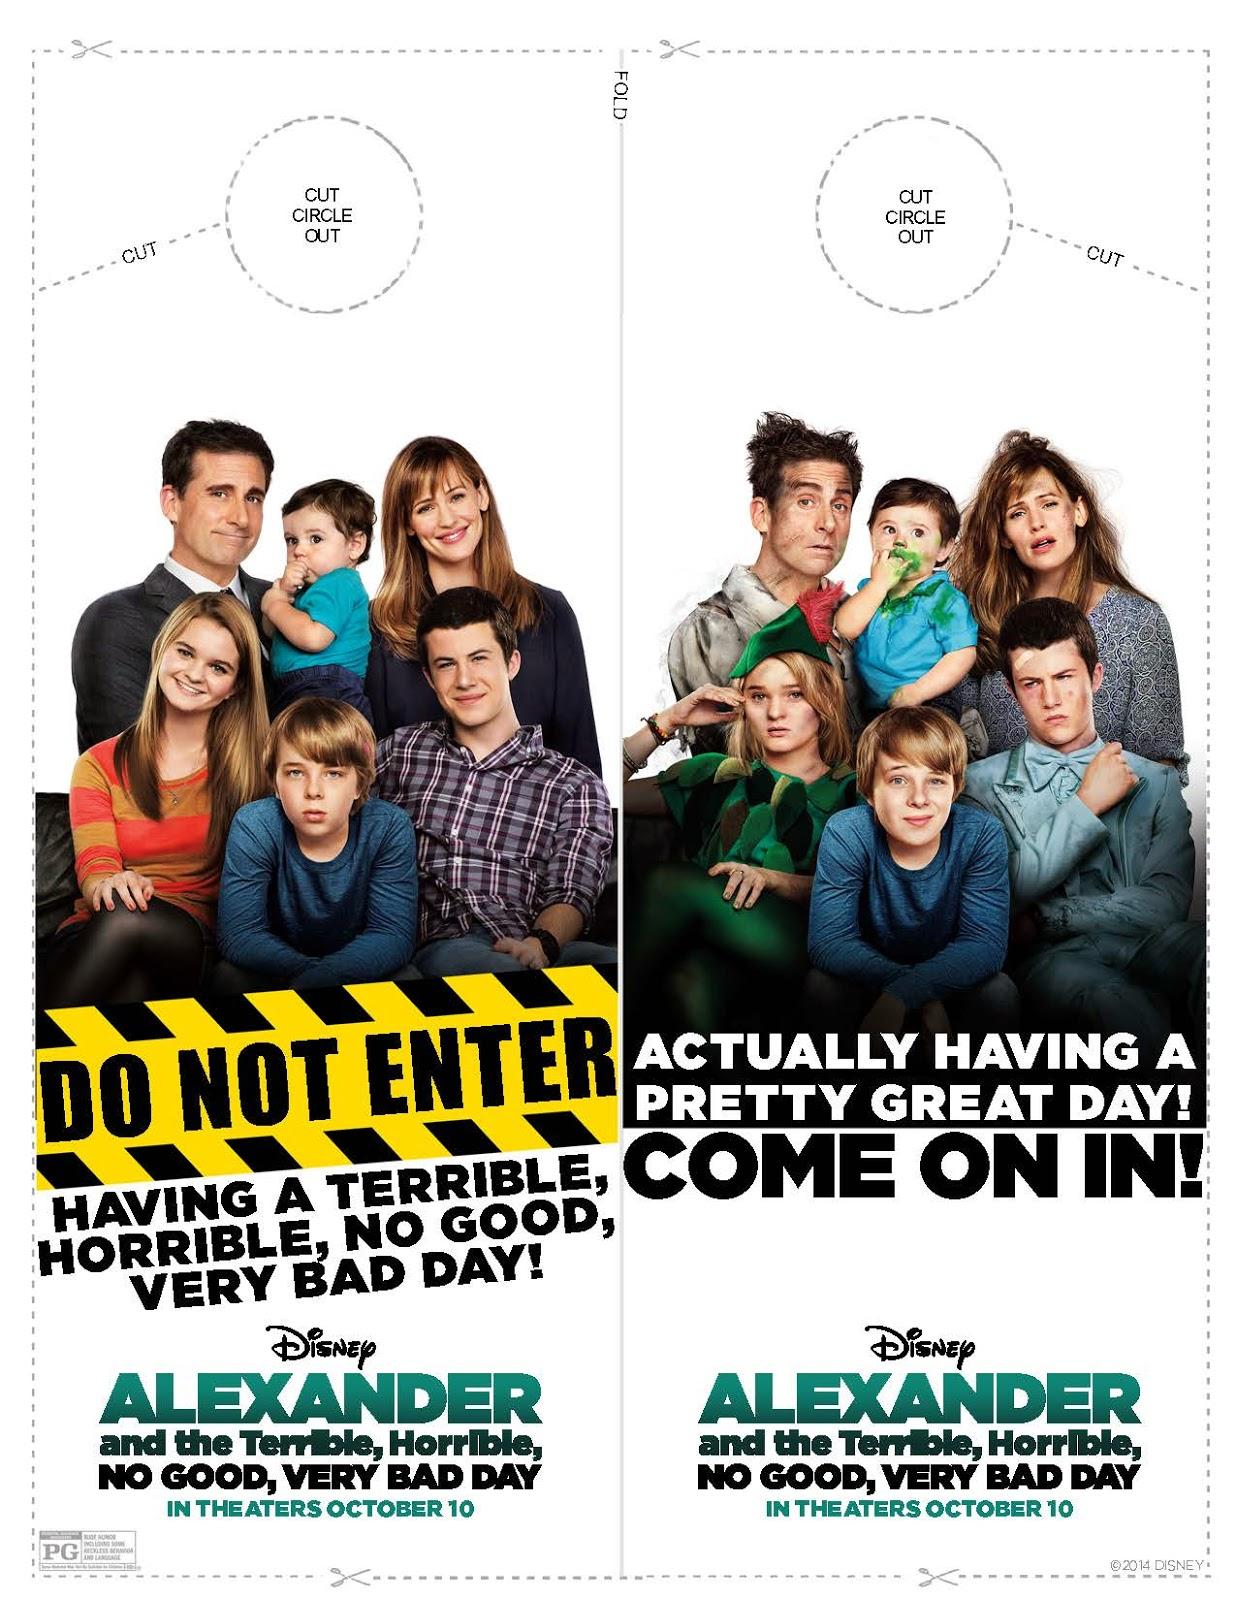 Disney's Alexander film